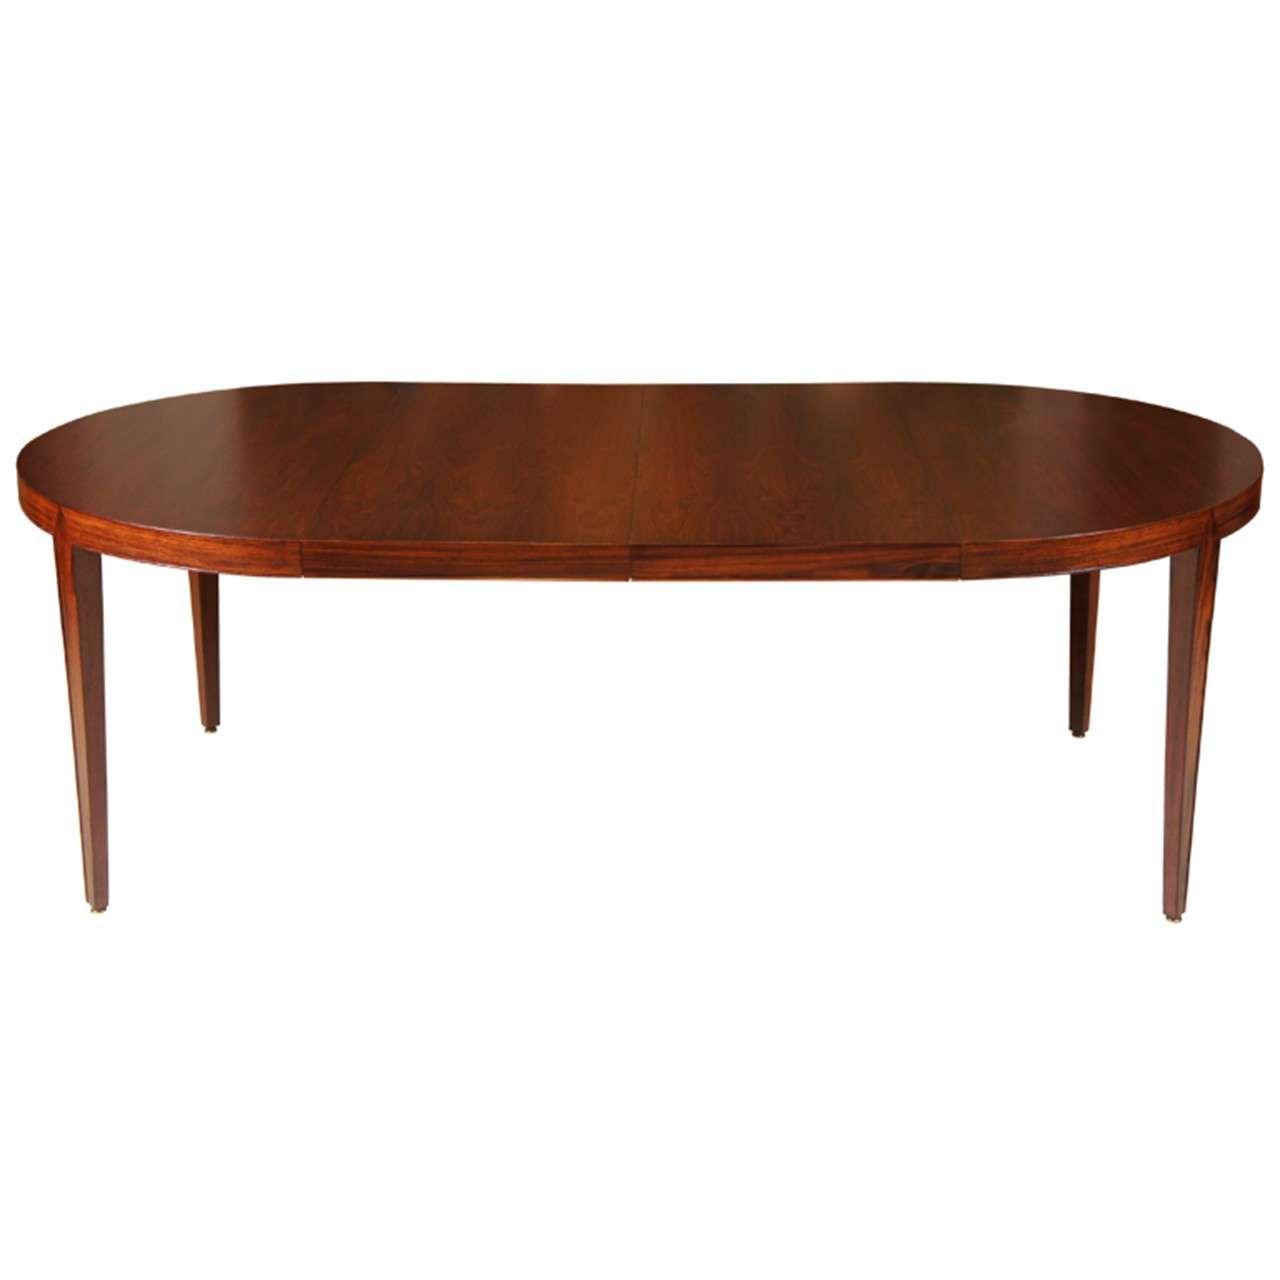 Danish Modern Rosewood Dining Table : X from 1stdibs.com size 1280 x 1280 jpeg 27kB